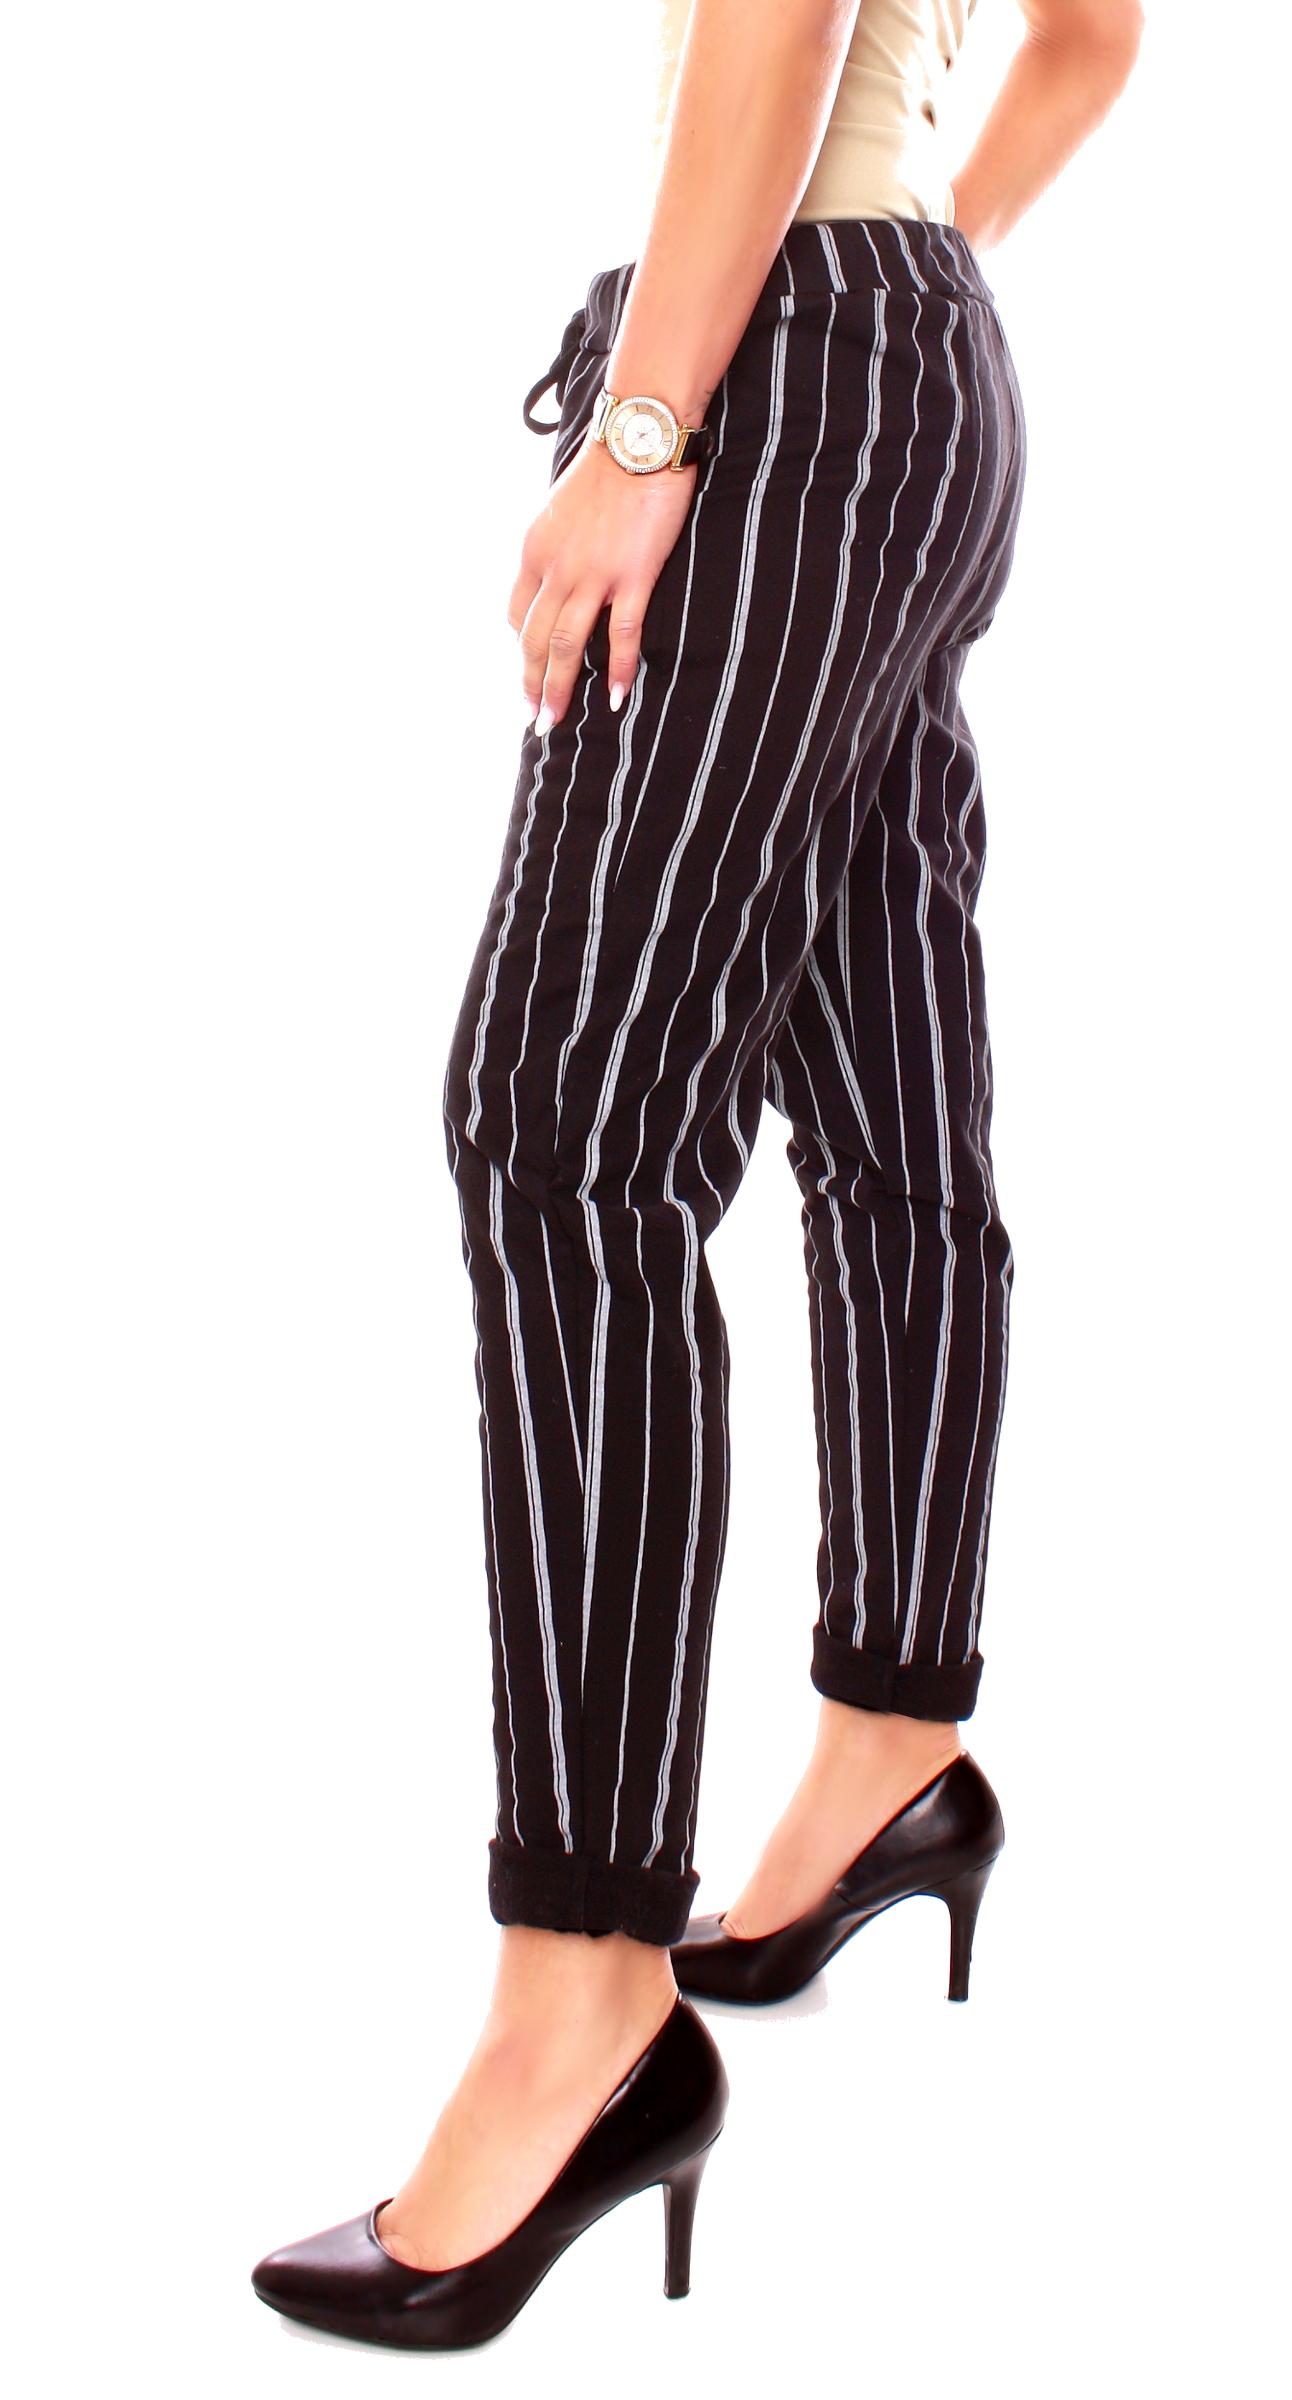 Damen Thermo Joggpants Thermojoggpants Gefleect Karo Glencheck Streifen Muster